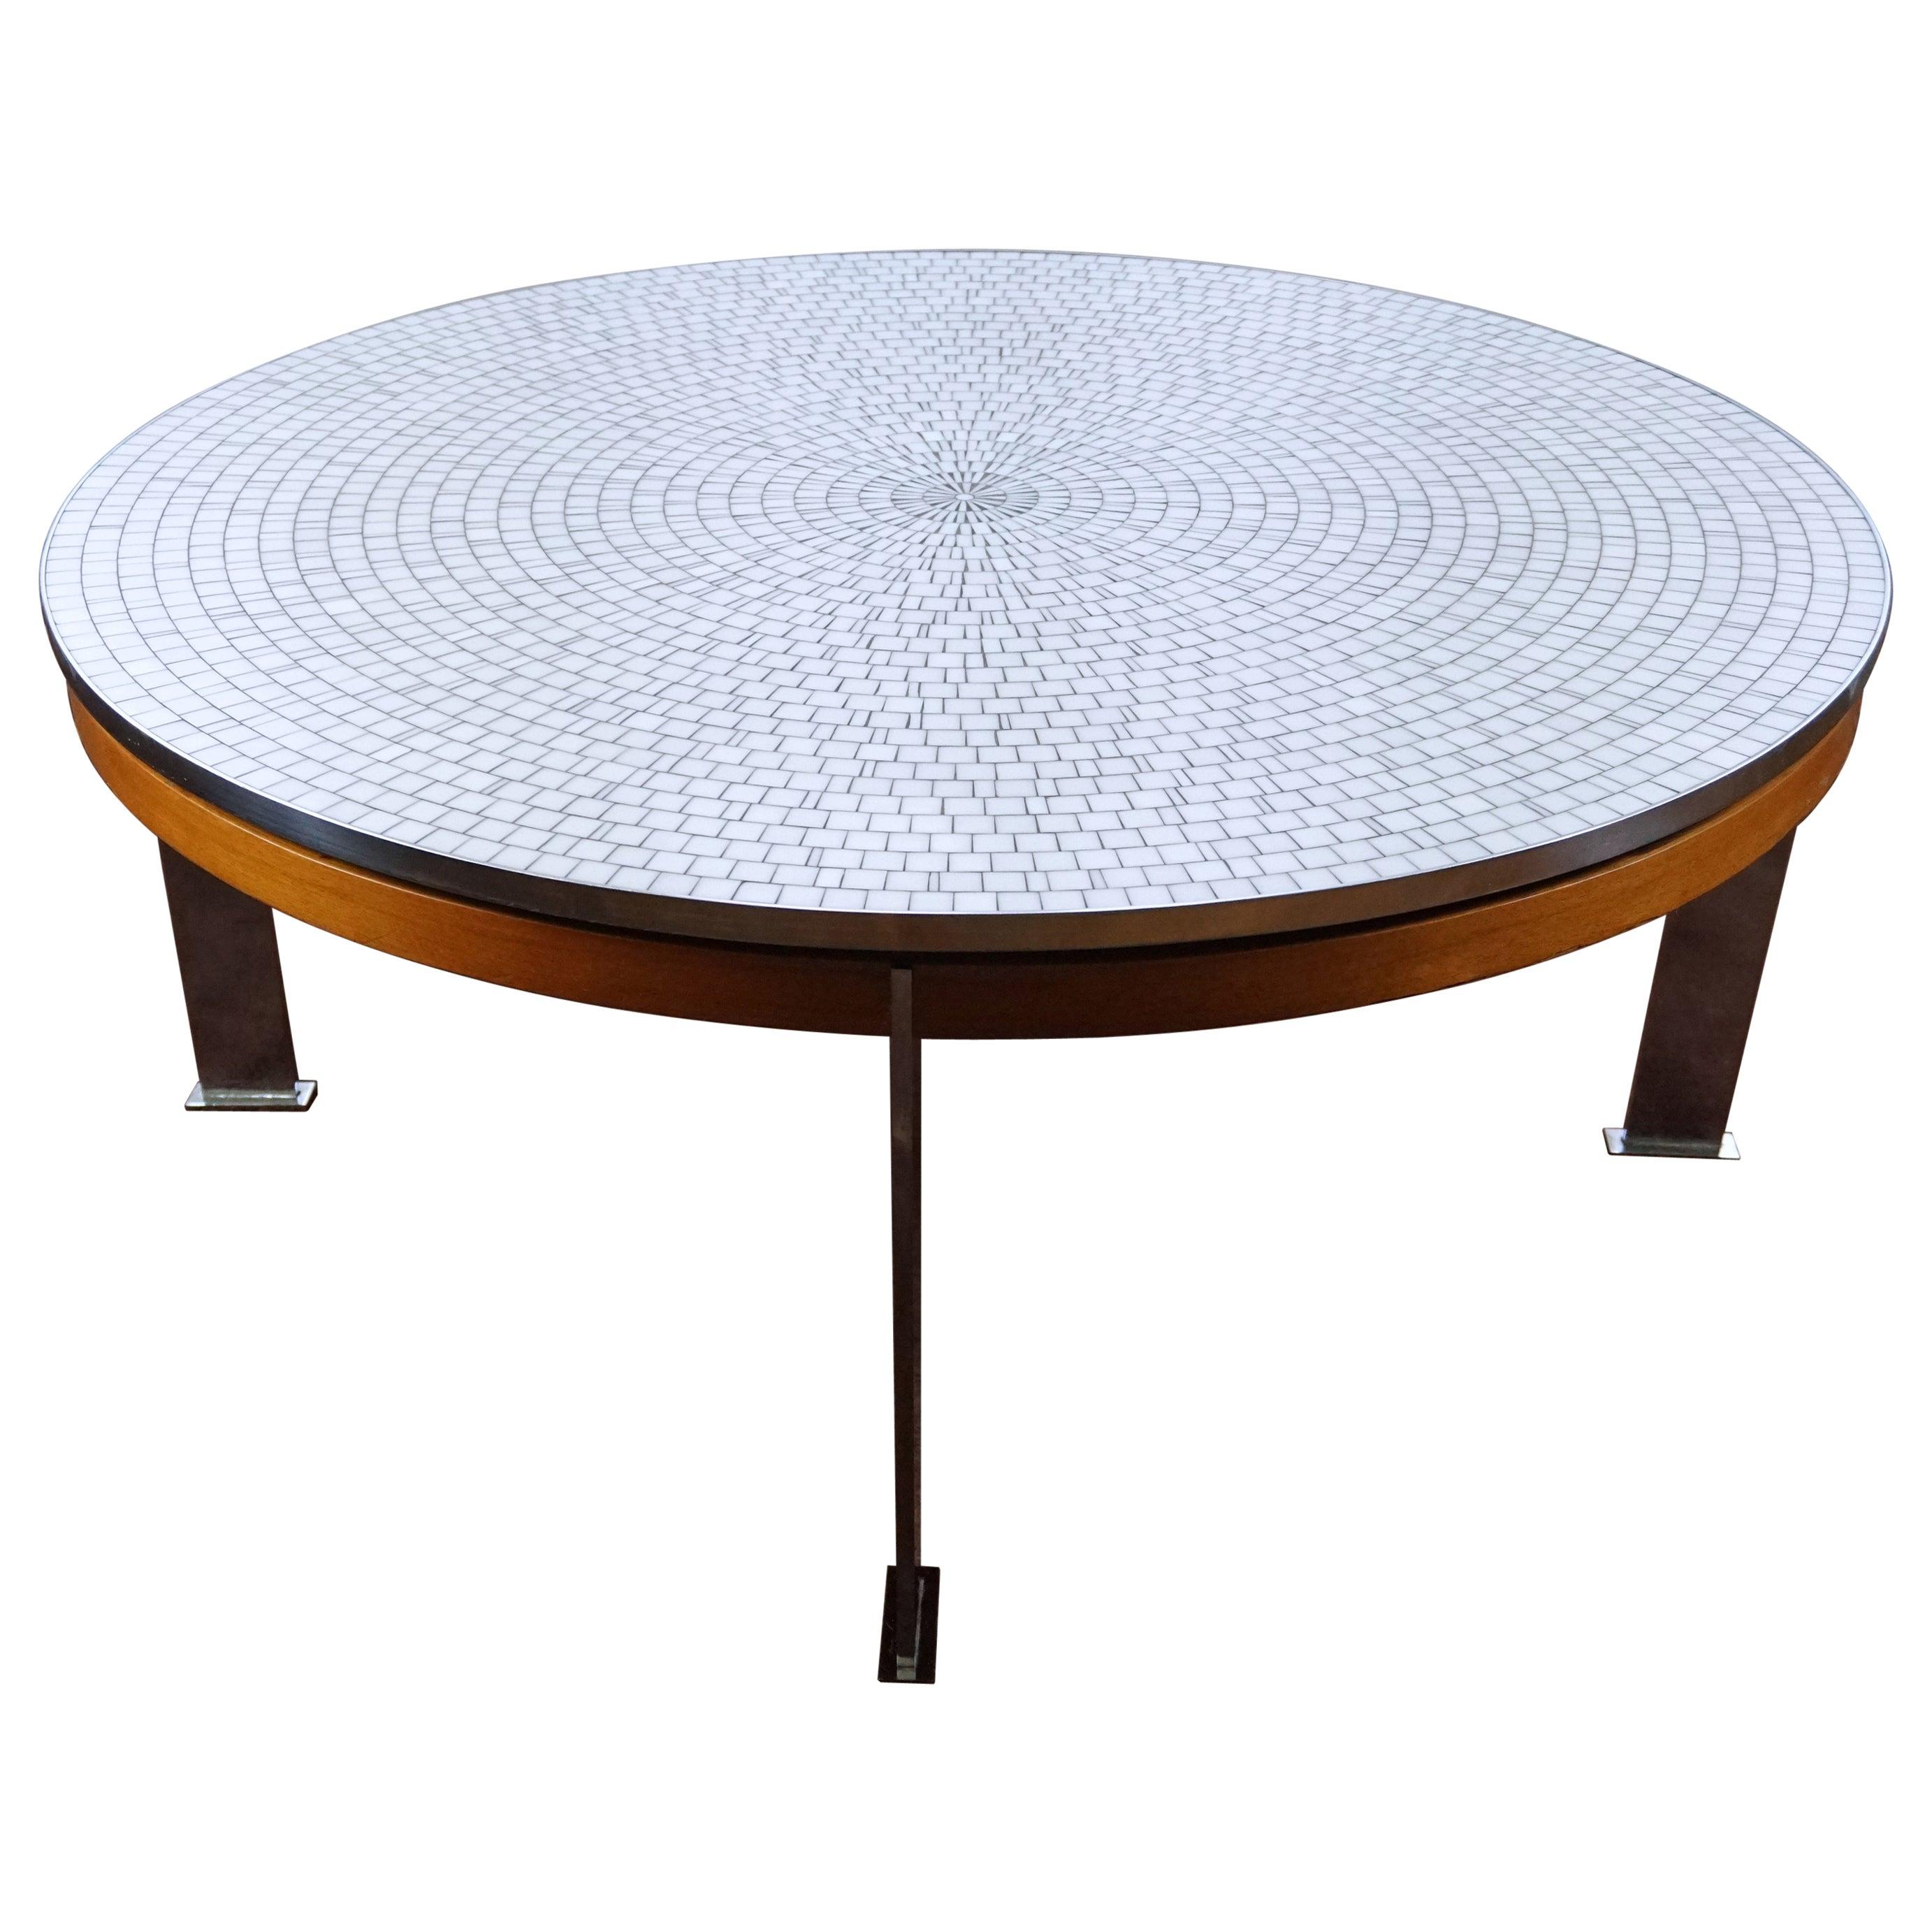 Berthold Müller Oerlinghausen Midcentury Mosaic Large Round Coffee Table, 1960s